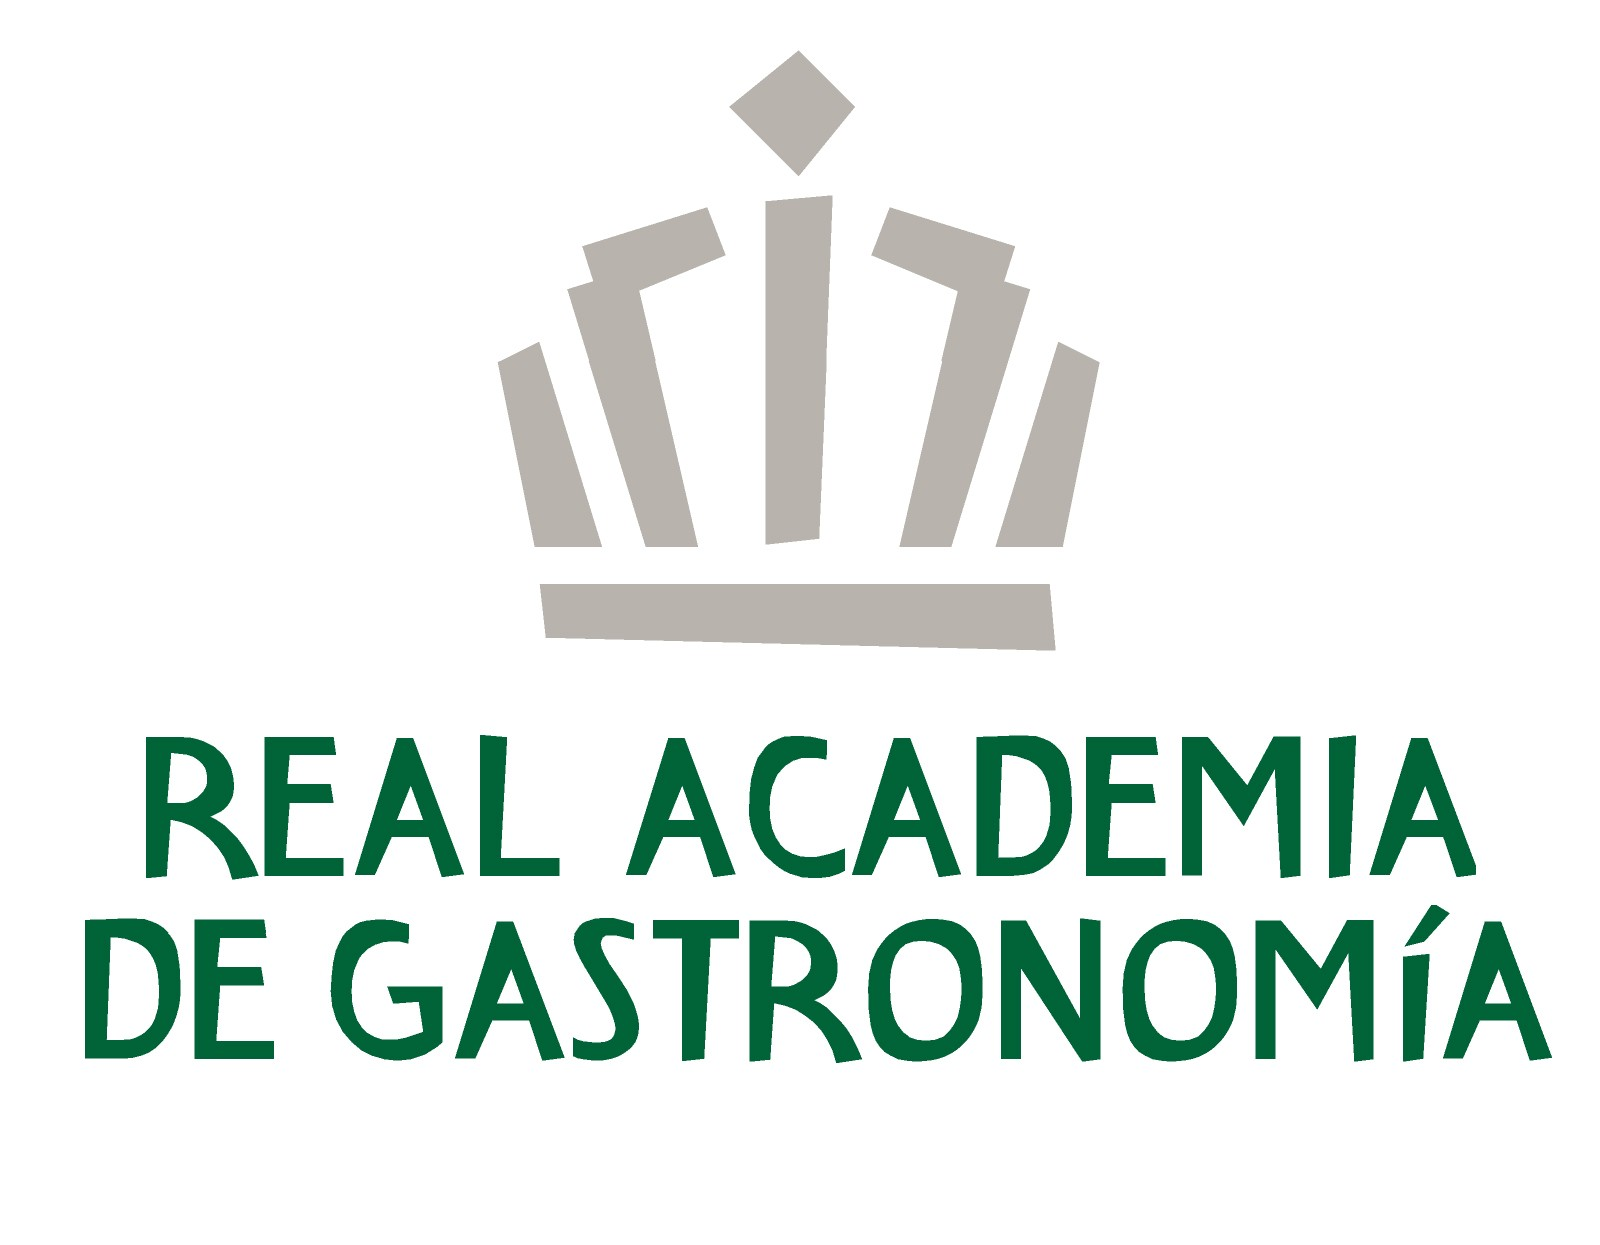 real academia gastronomia